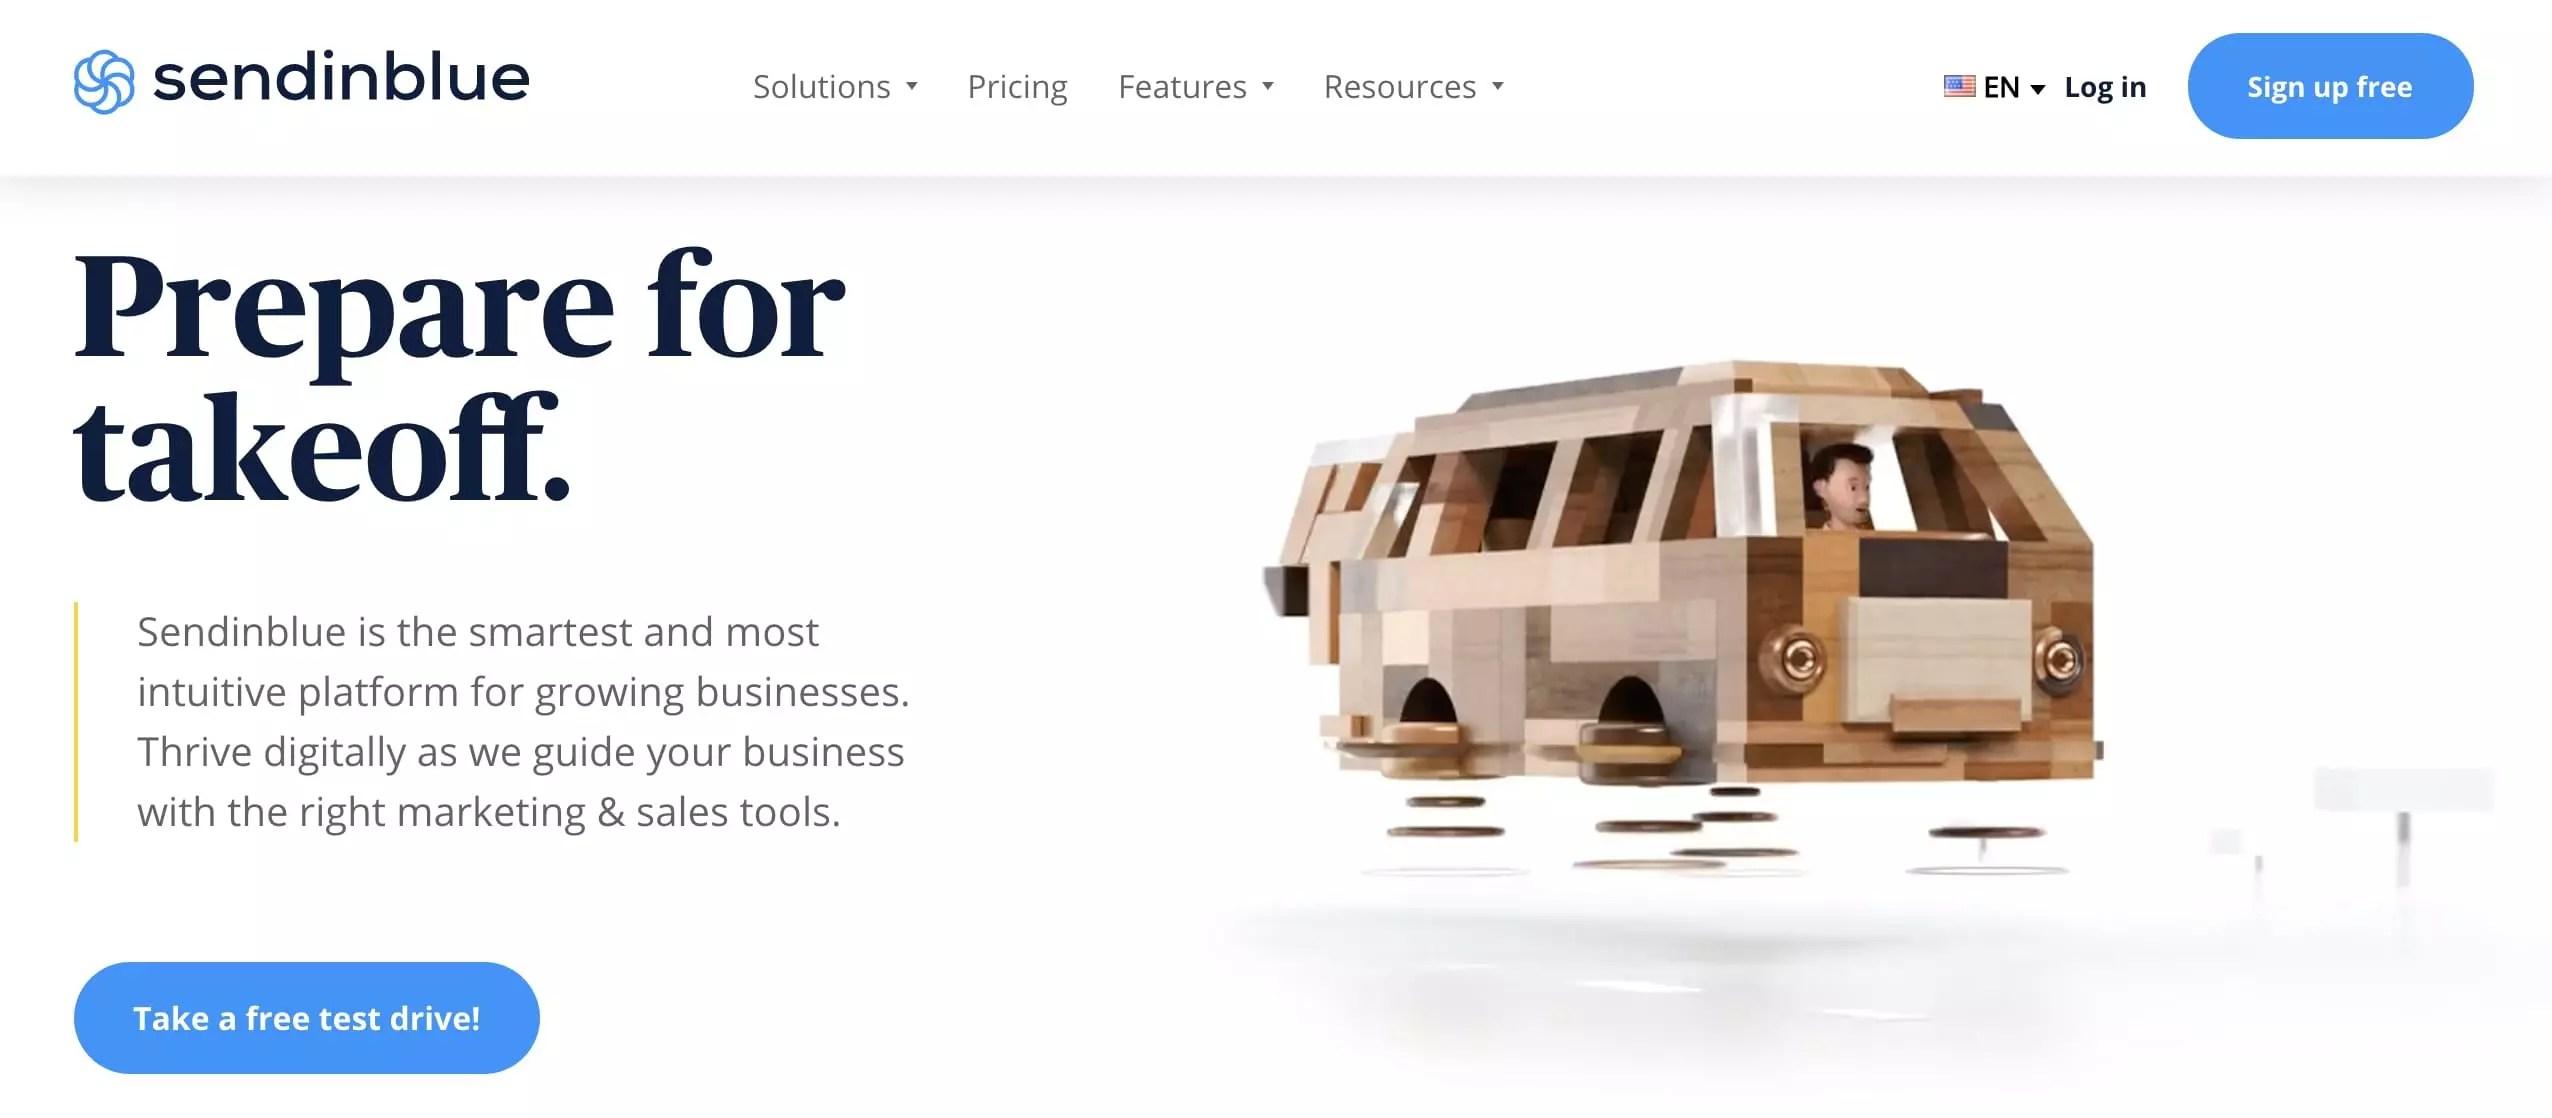 Email marketing automation tool Sendinblue